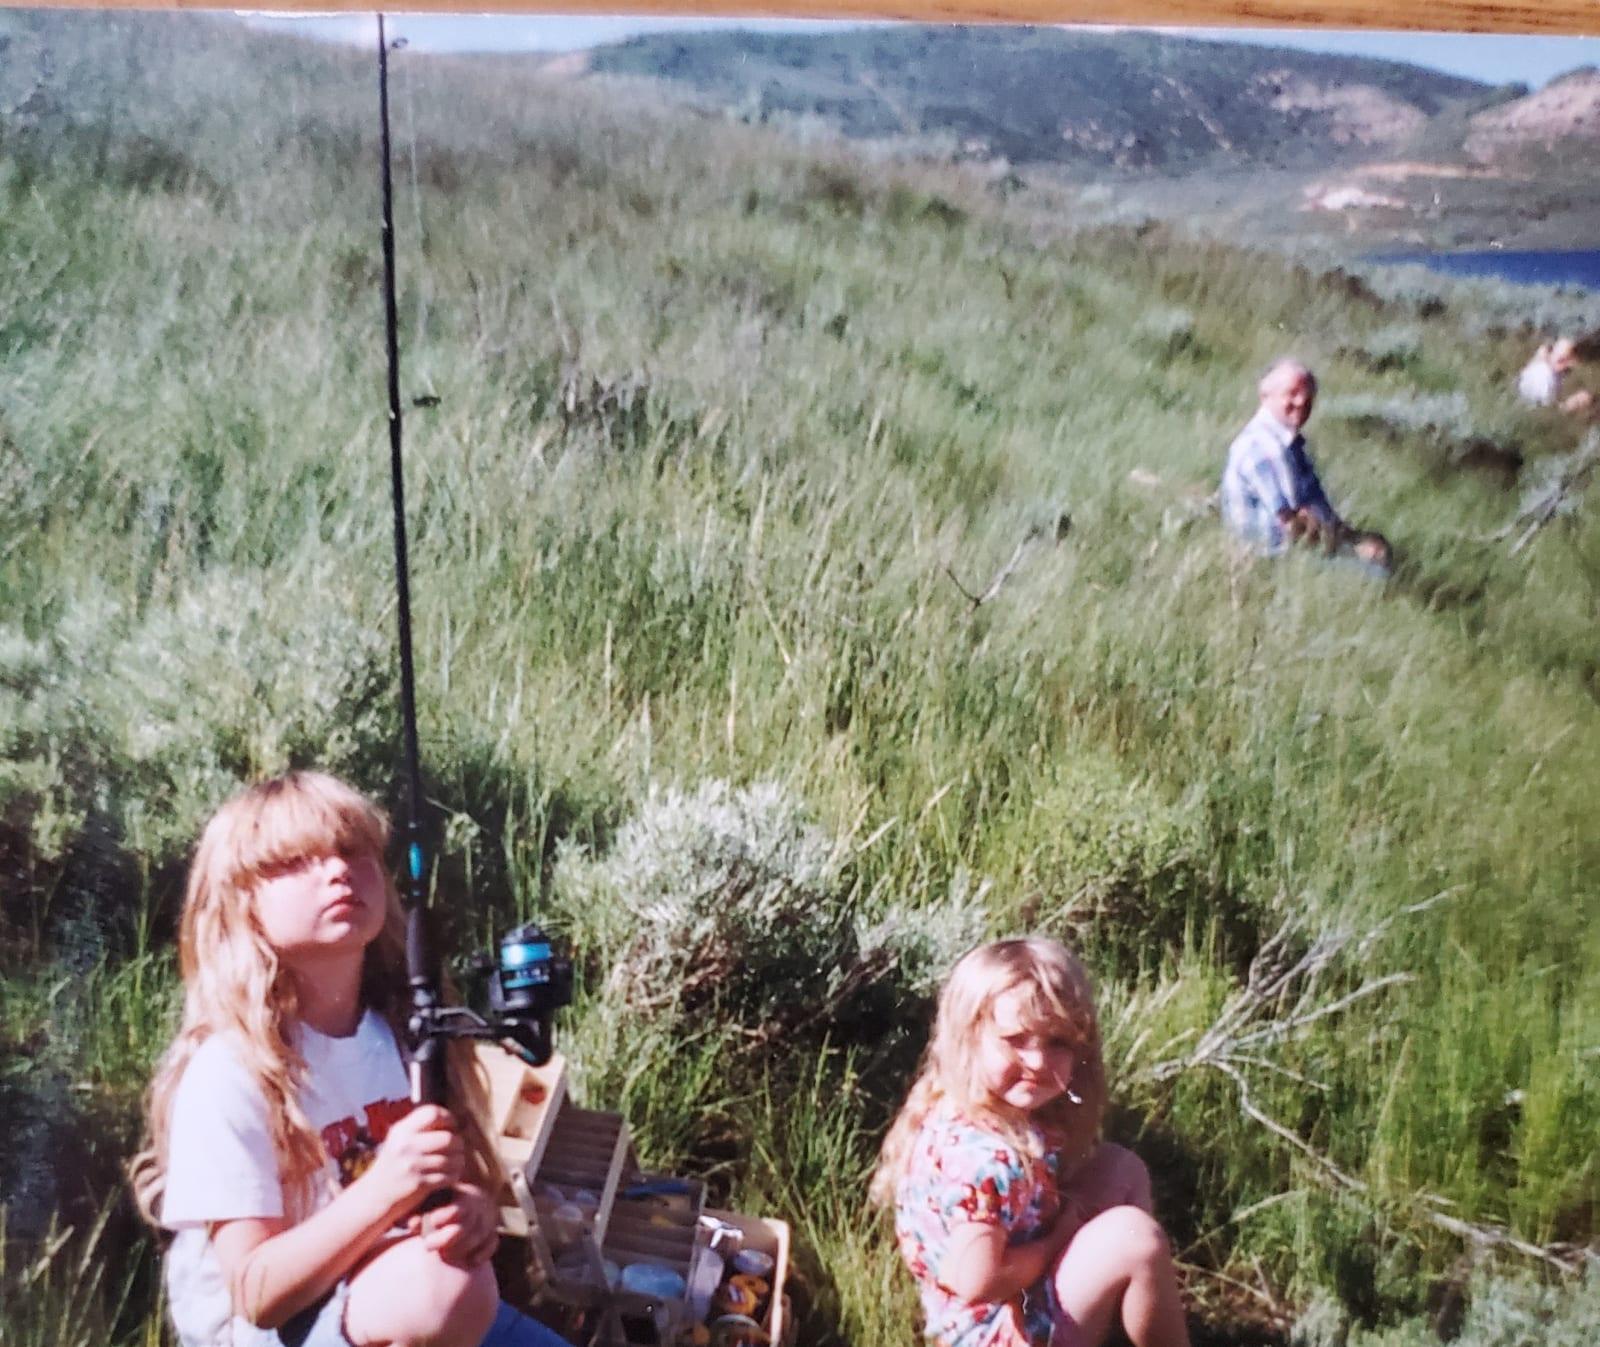 Fishing at Strawberry with chauny and grandpa Wagstaff